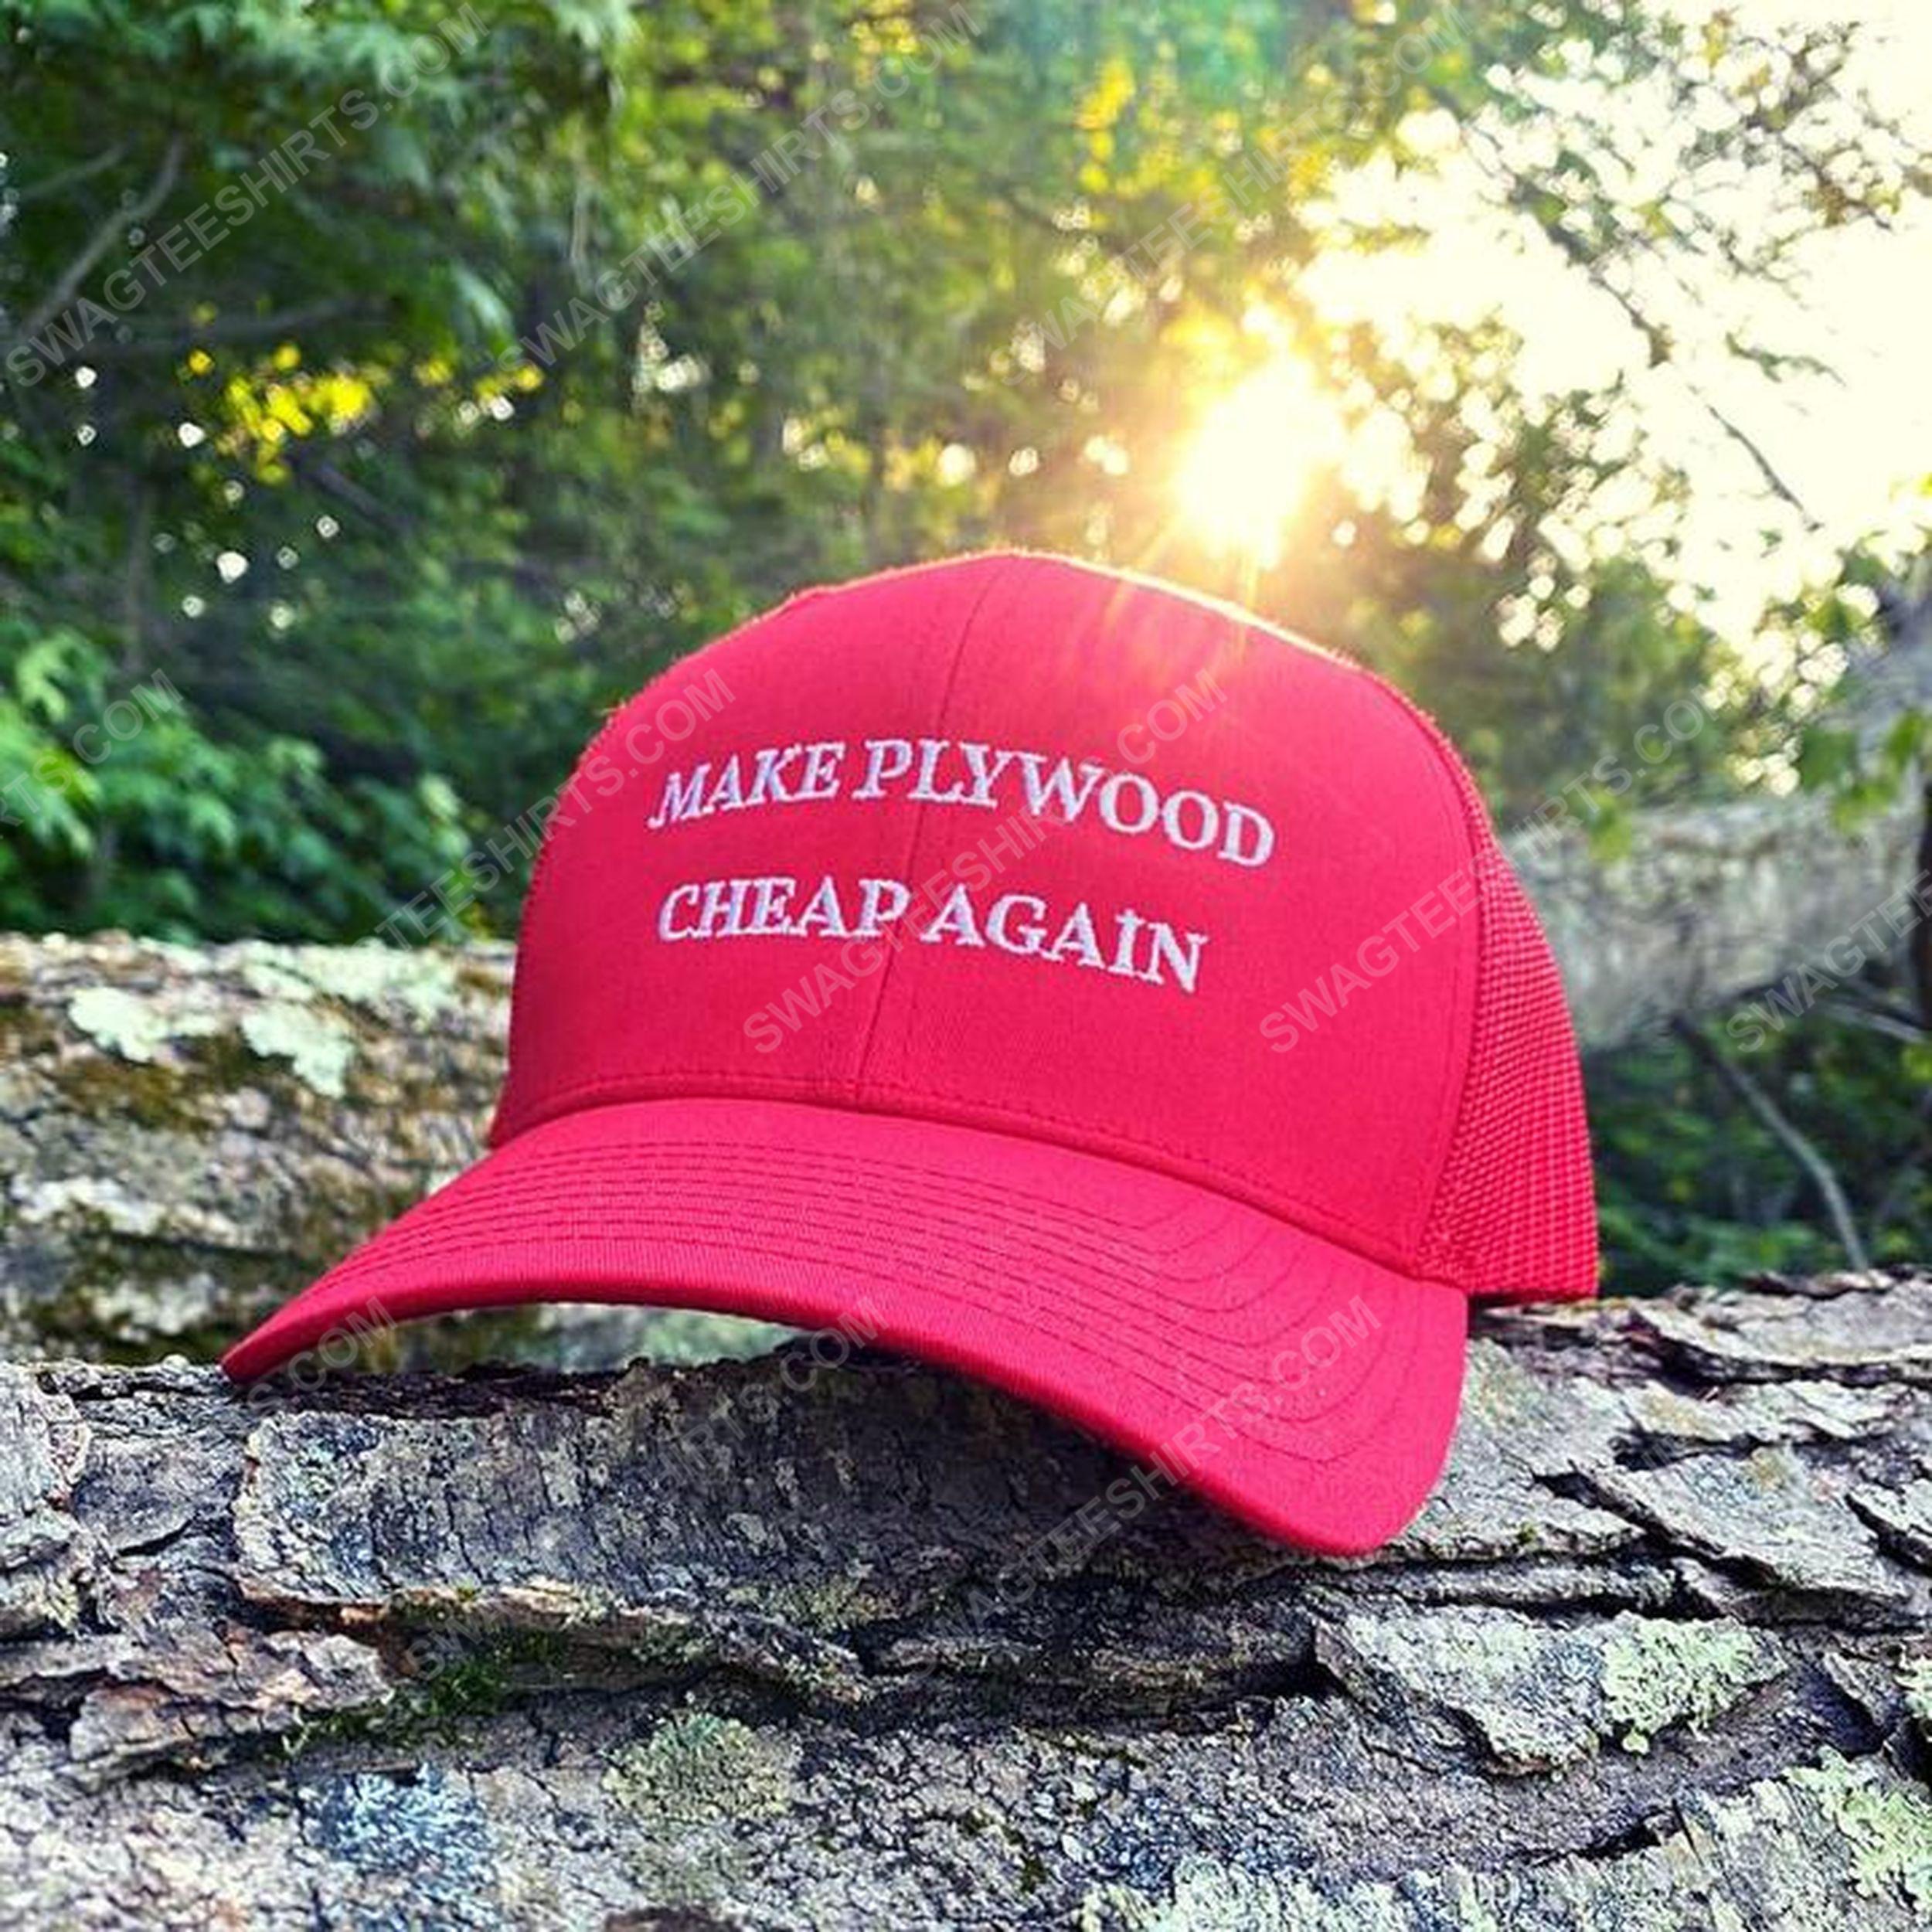 Make plywood cheap again full print classic hat 1 - Copy (3)